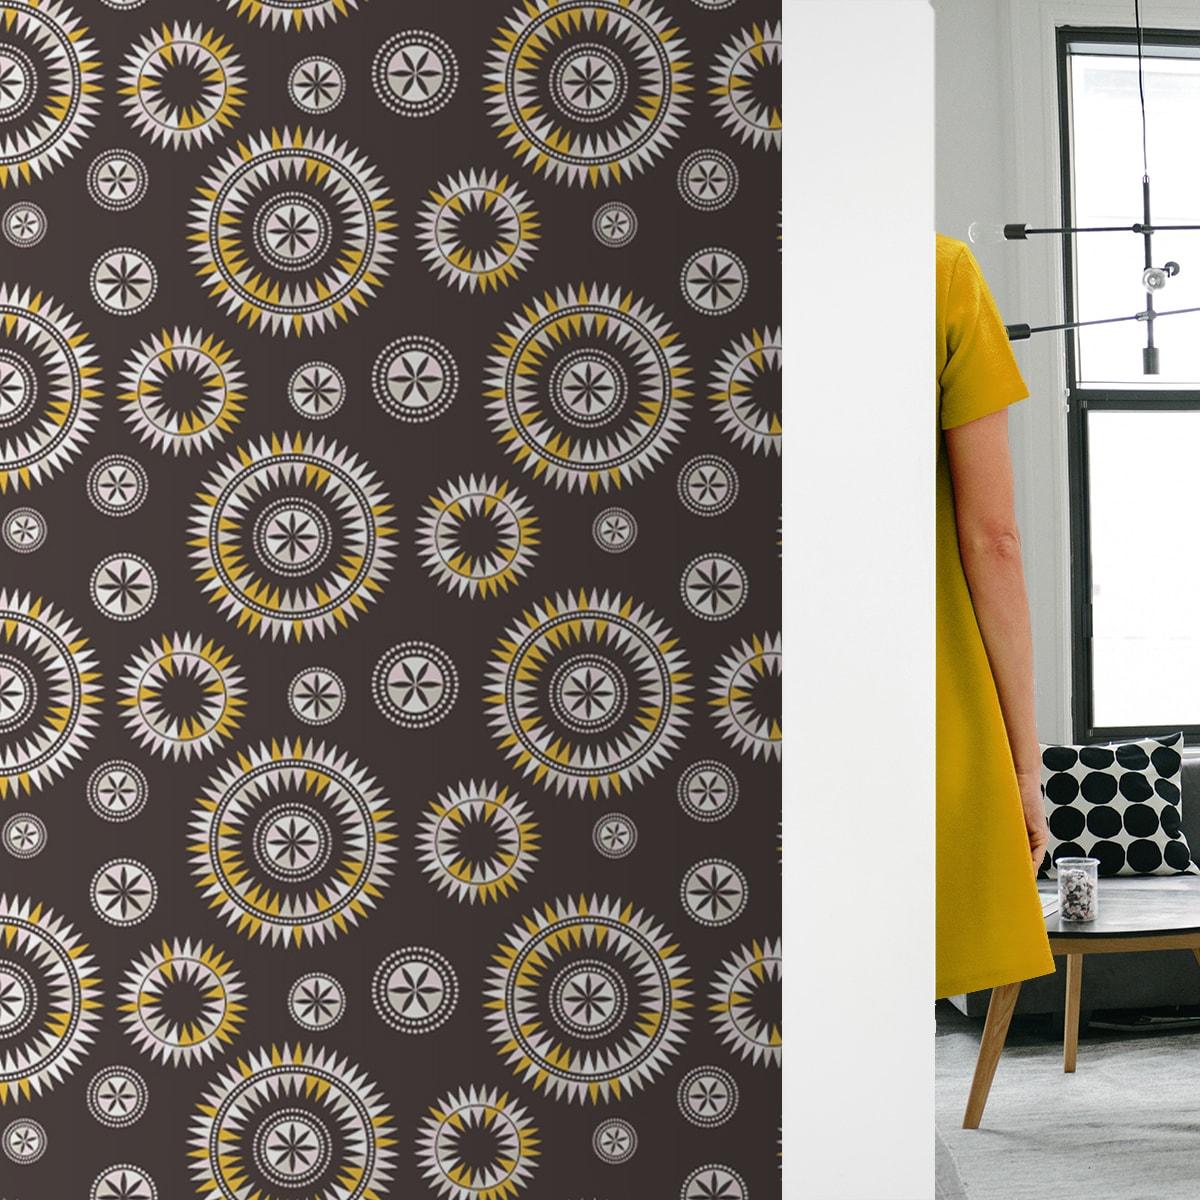 windrose moderne tapete skandinavisches design gmm. Black Bedroom Furniture Sets. Home Design Ideas